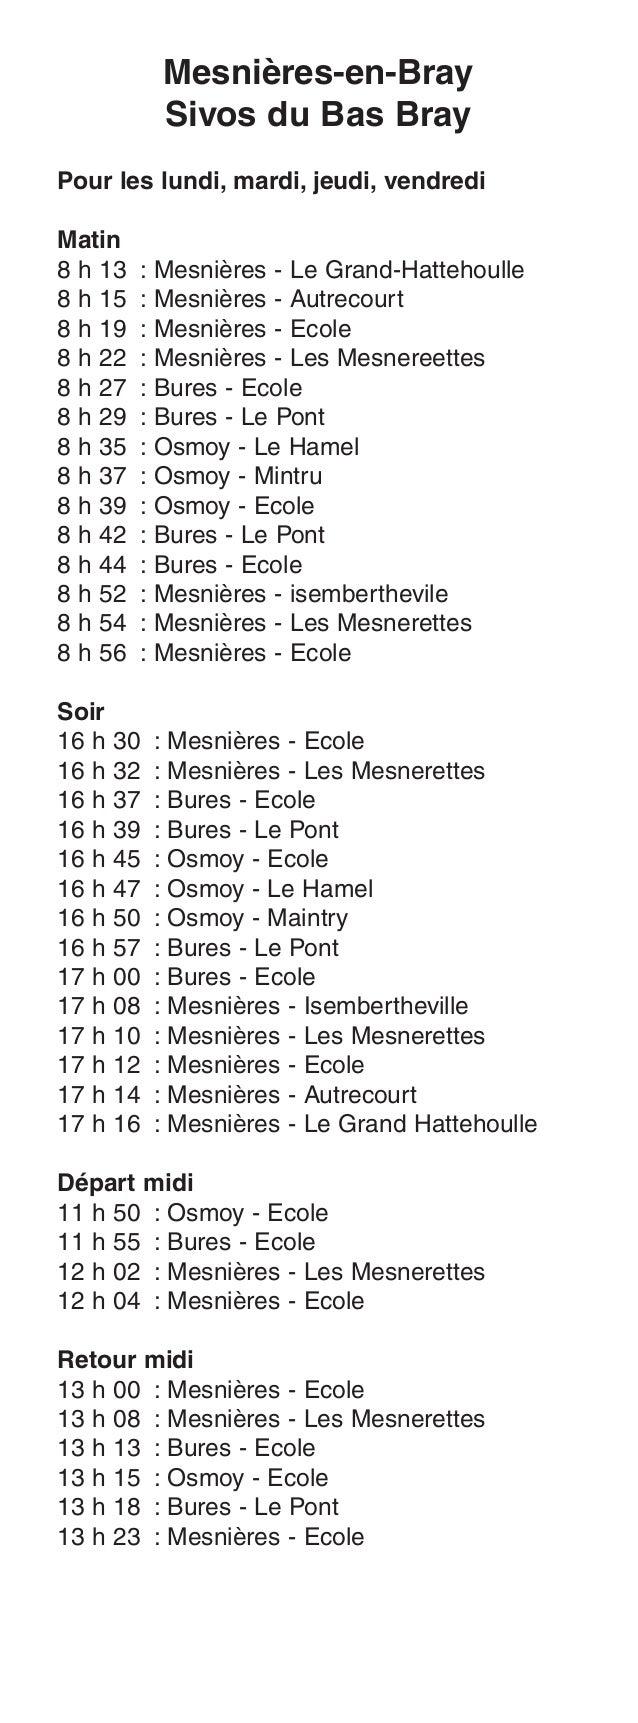 Mesnières-en-Bray Sivos du Bas Bray Pour les lundi, mardi, jeudi, vendredi Matin 8 h 13 : Mesnières - Le Grand-Hattehoulle...